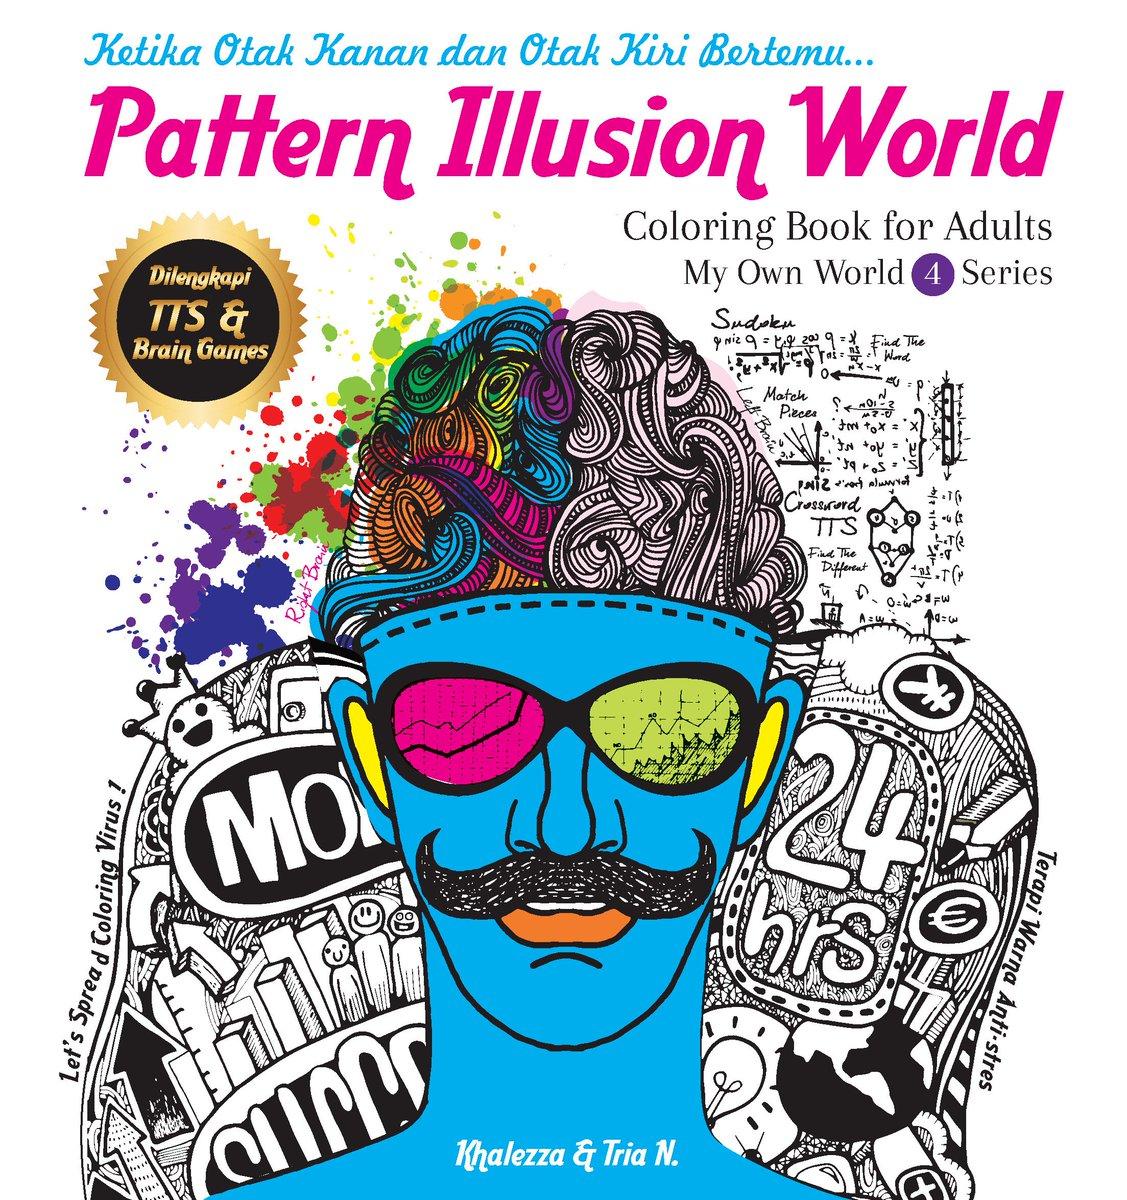 PatternIllusionWorld Coloring Book For Adults Harga Rp62000 Tersedia Di Gramedia Cc Gramedmatraman Tco 1KqCU7TQXN